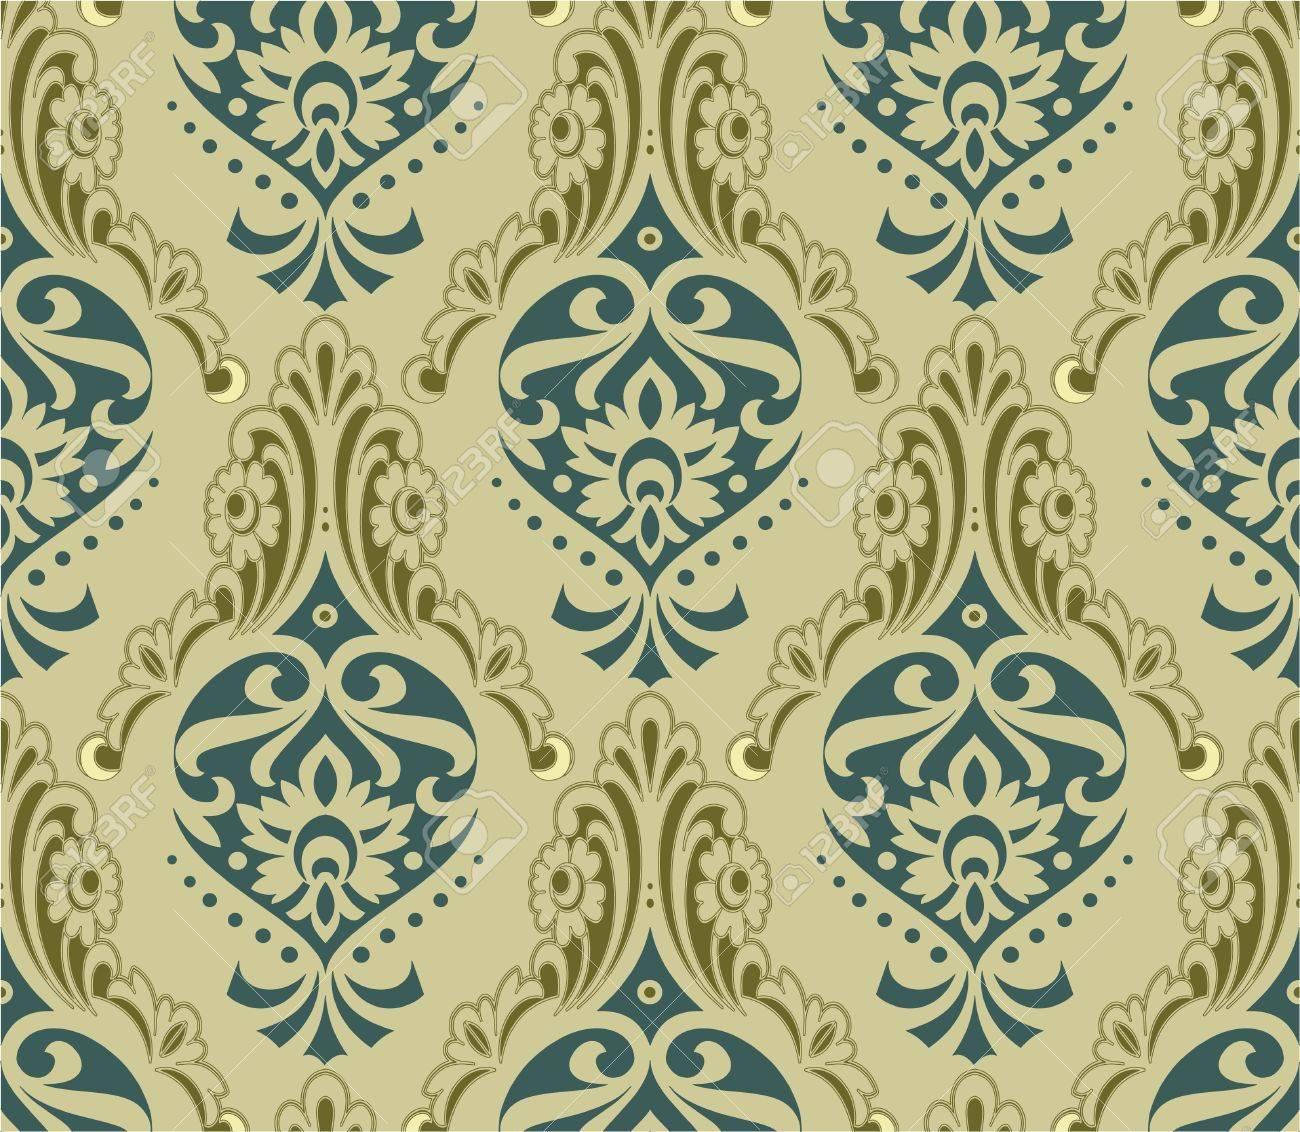 retro wallpaper Stock Vector - 12403763